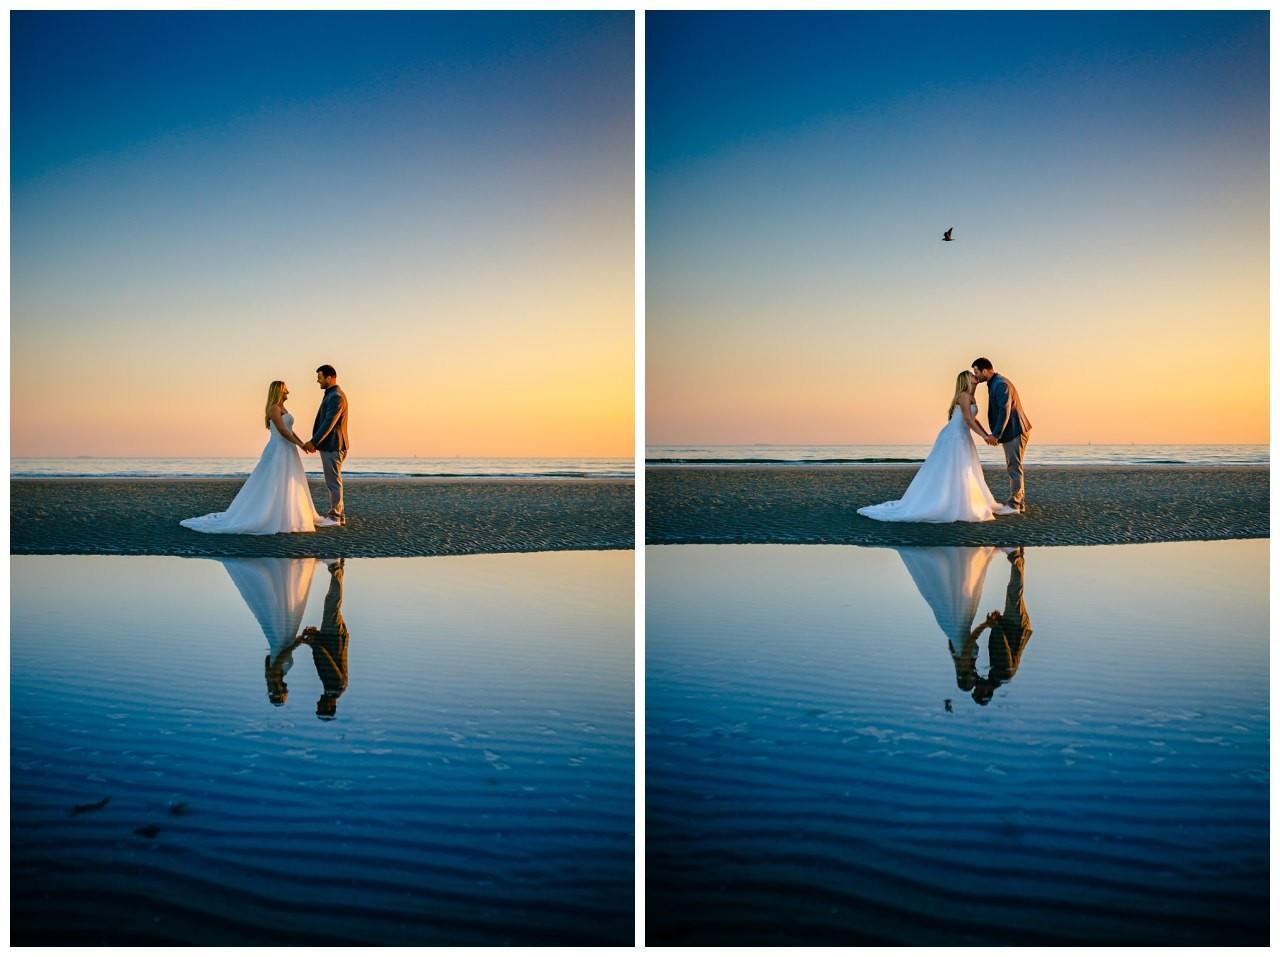 After Wedding Shooting Juist Hochzeitsfotos Nordsee Fotograf Insel 23 - After Wedding Shooting auf Juist